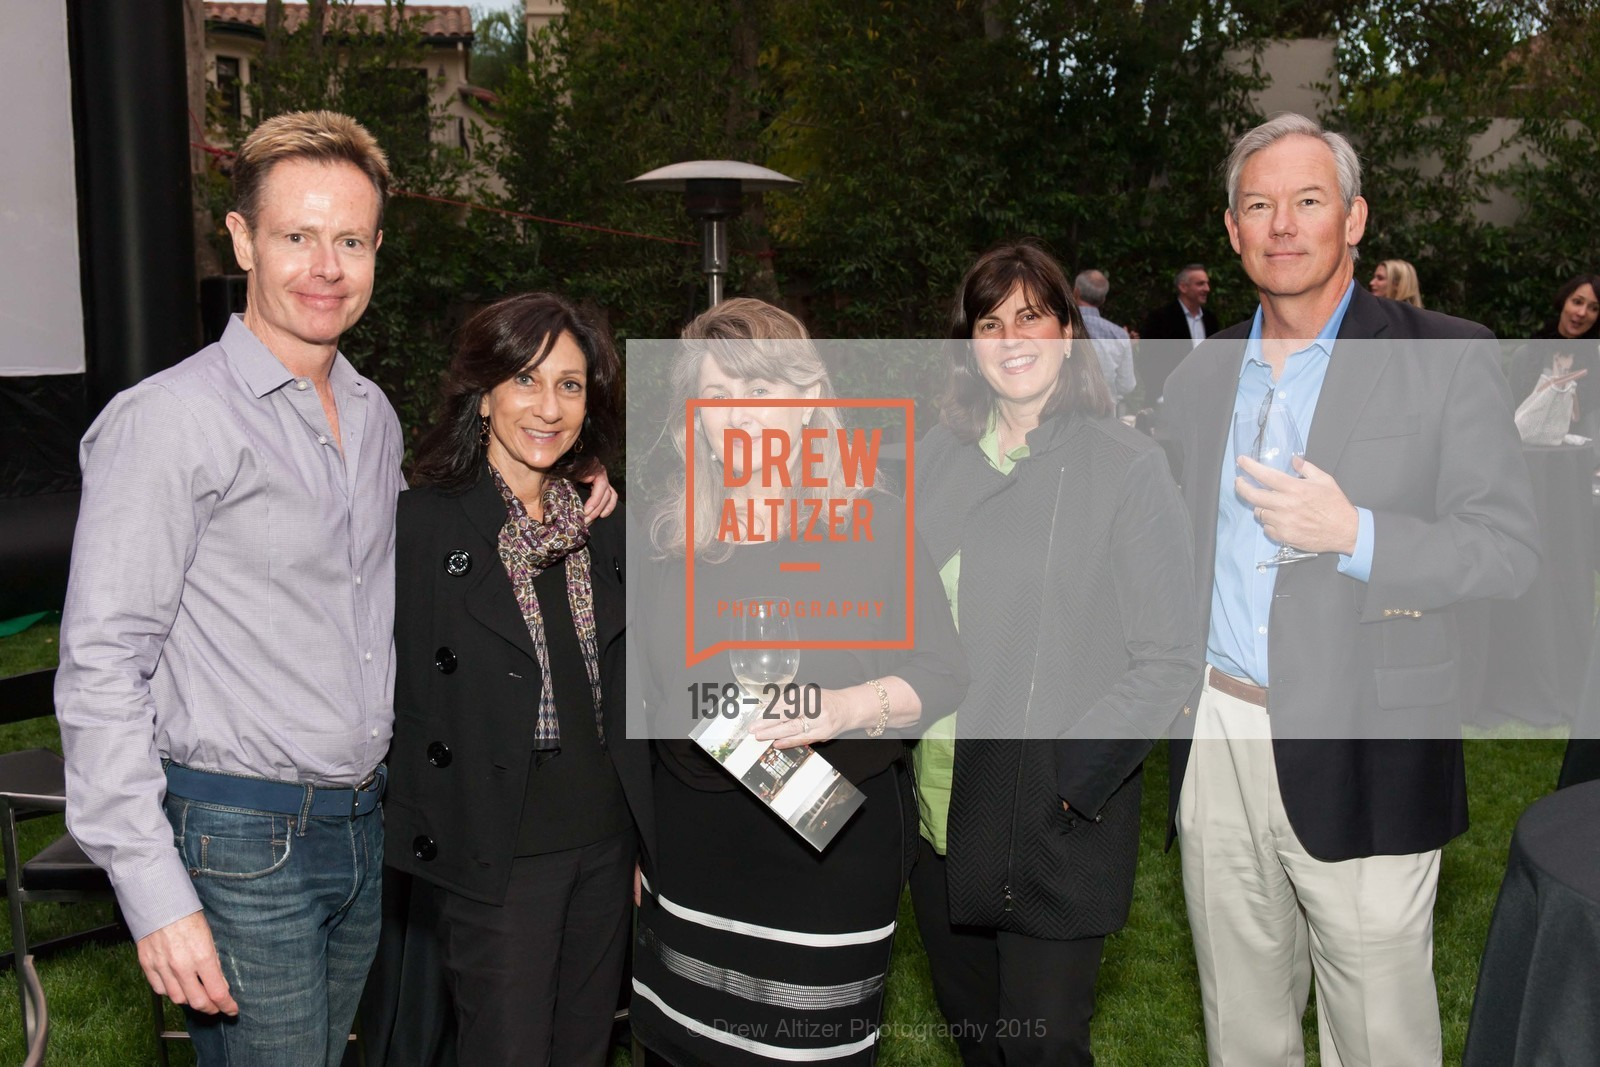 Brad Henning, Laurie Kraus Lacob, Marian Robertson, Steve Robertson, Photo #158-290